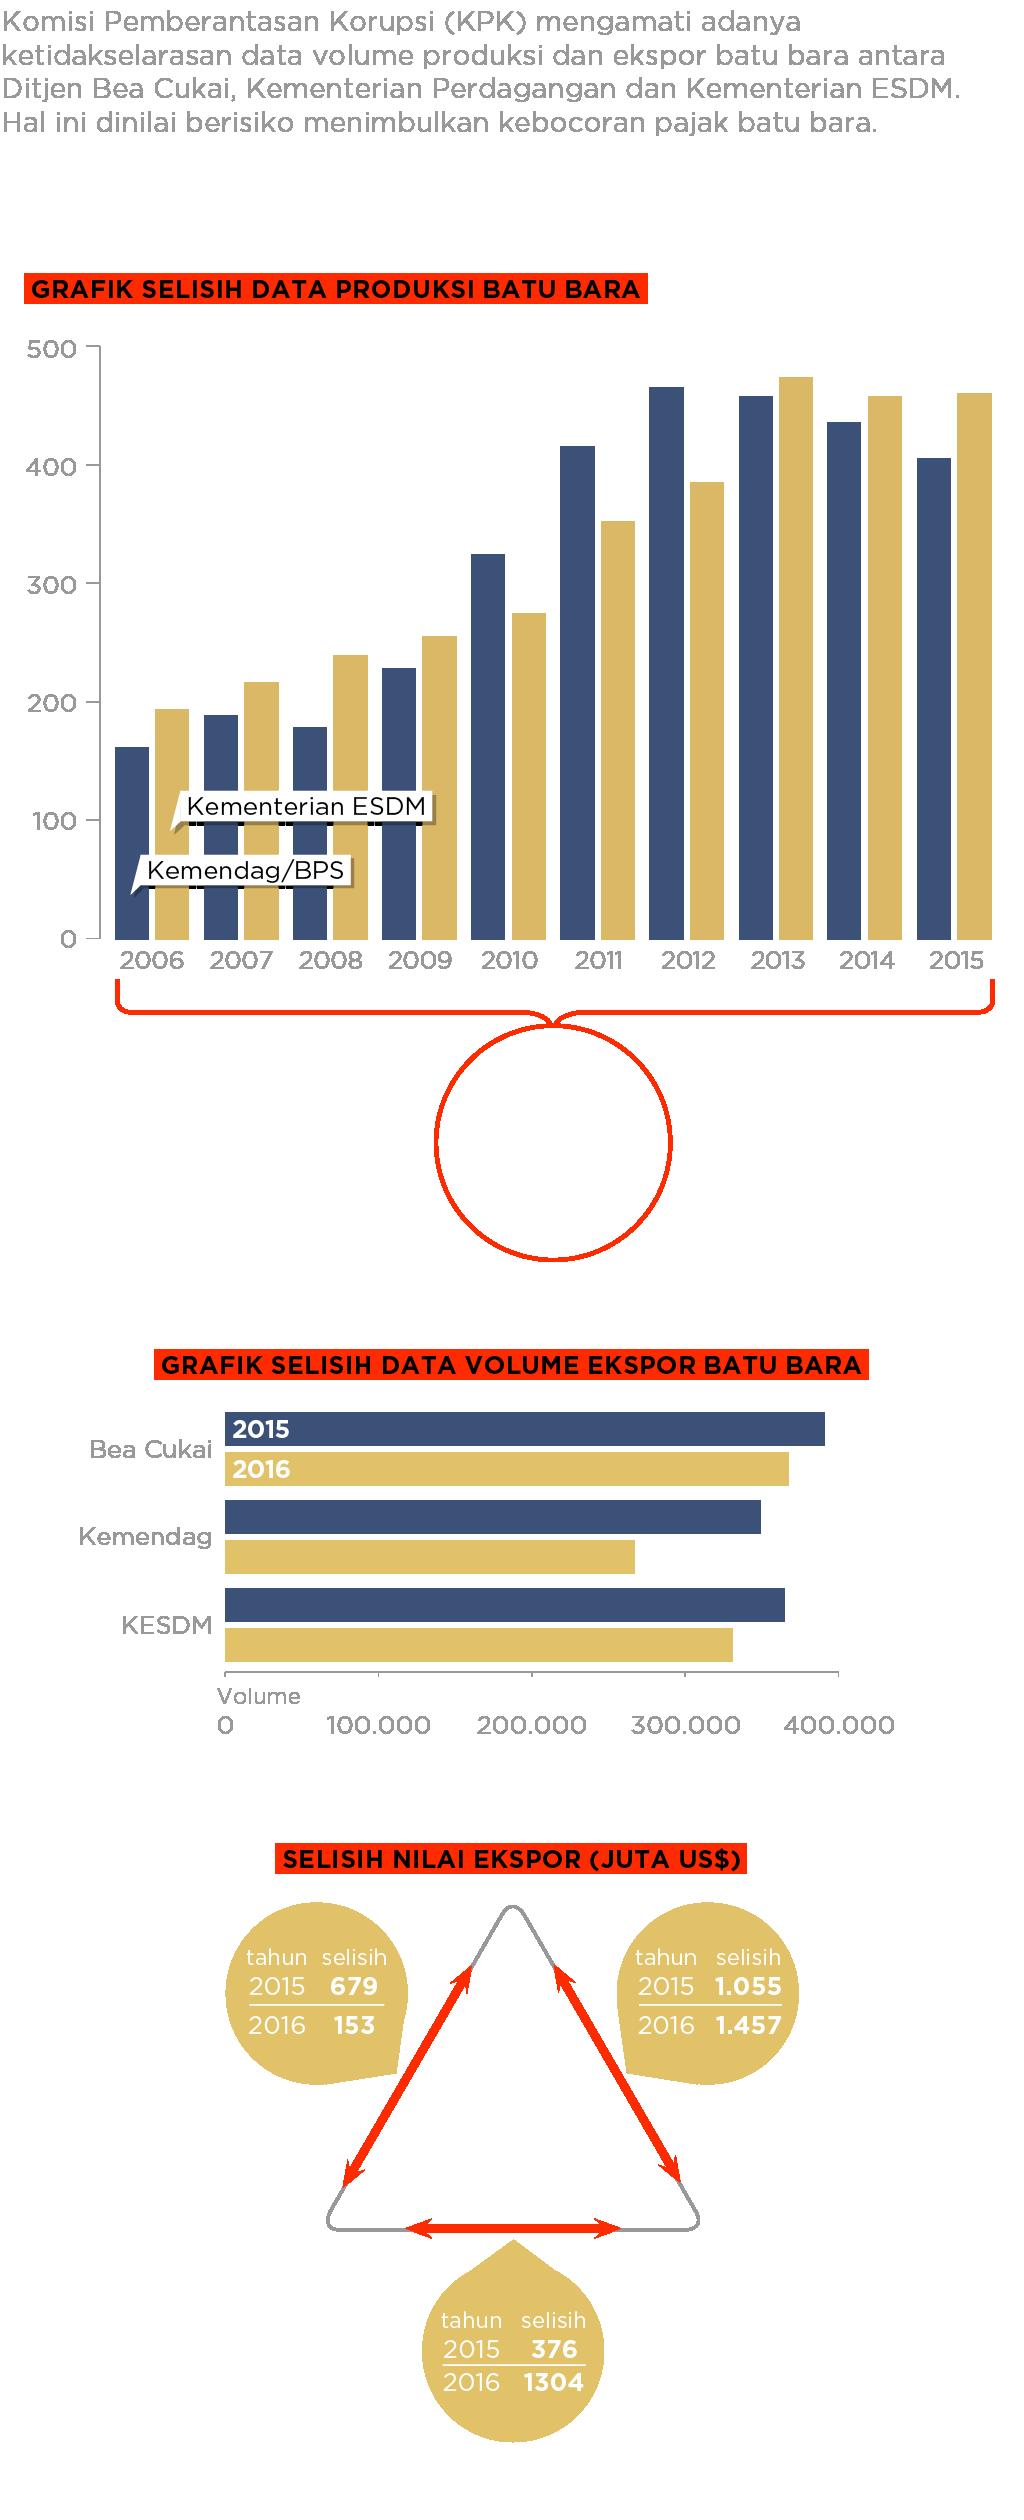 Grafik selisih data perdagangan produksi